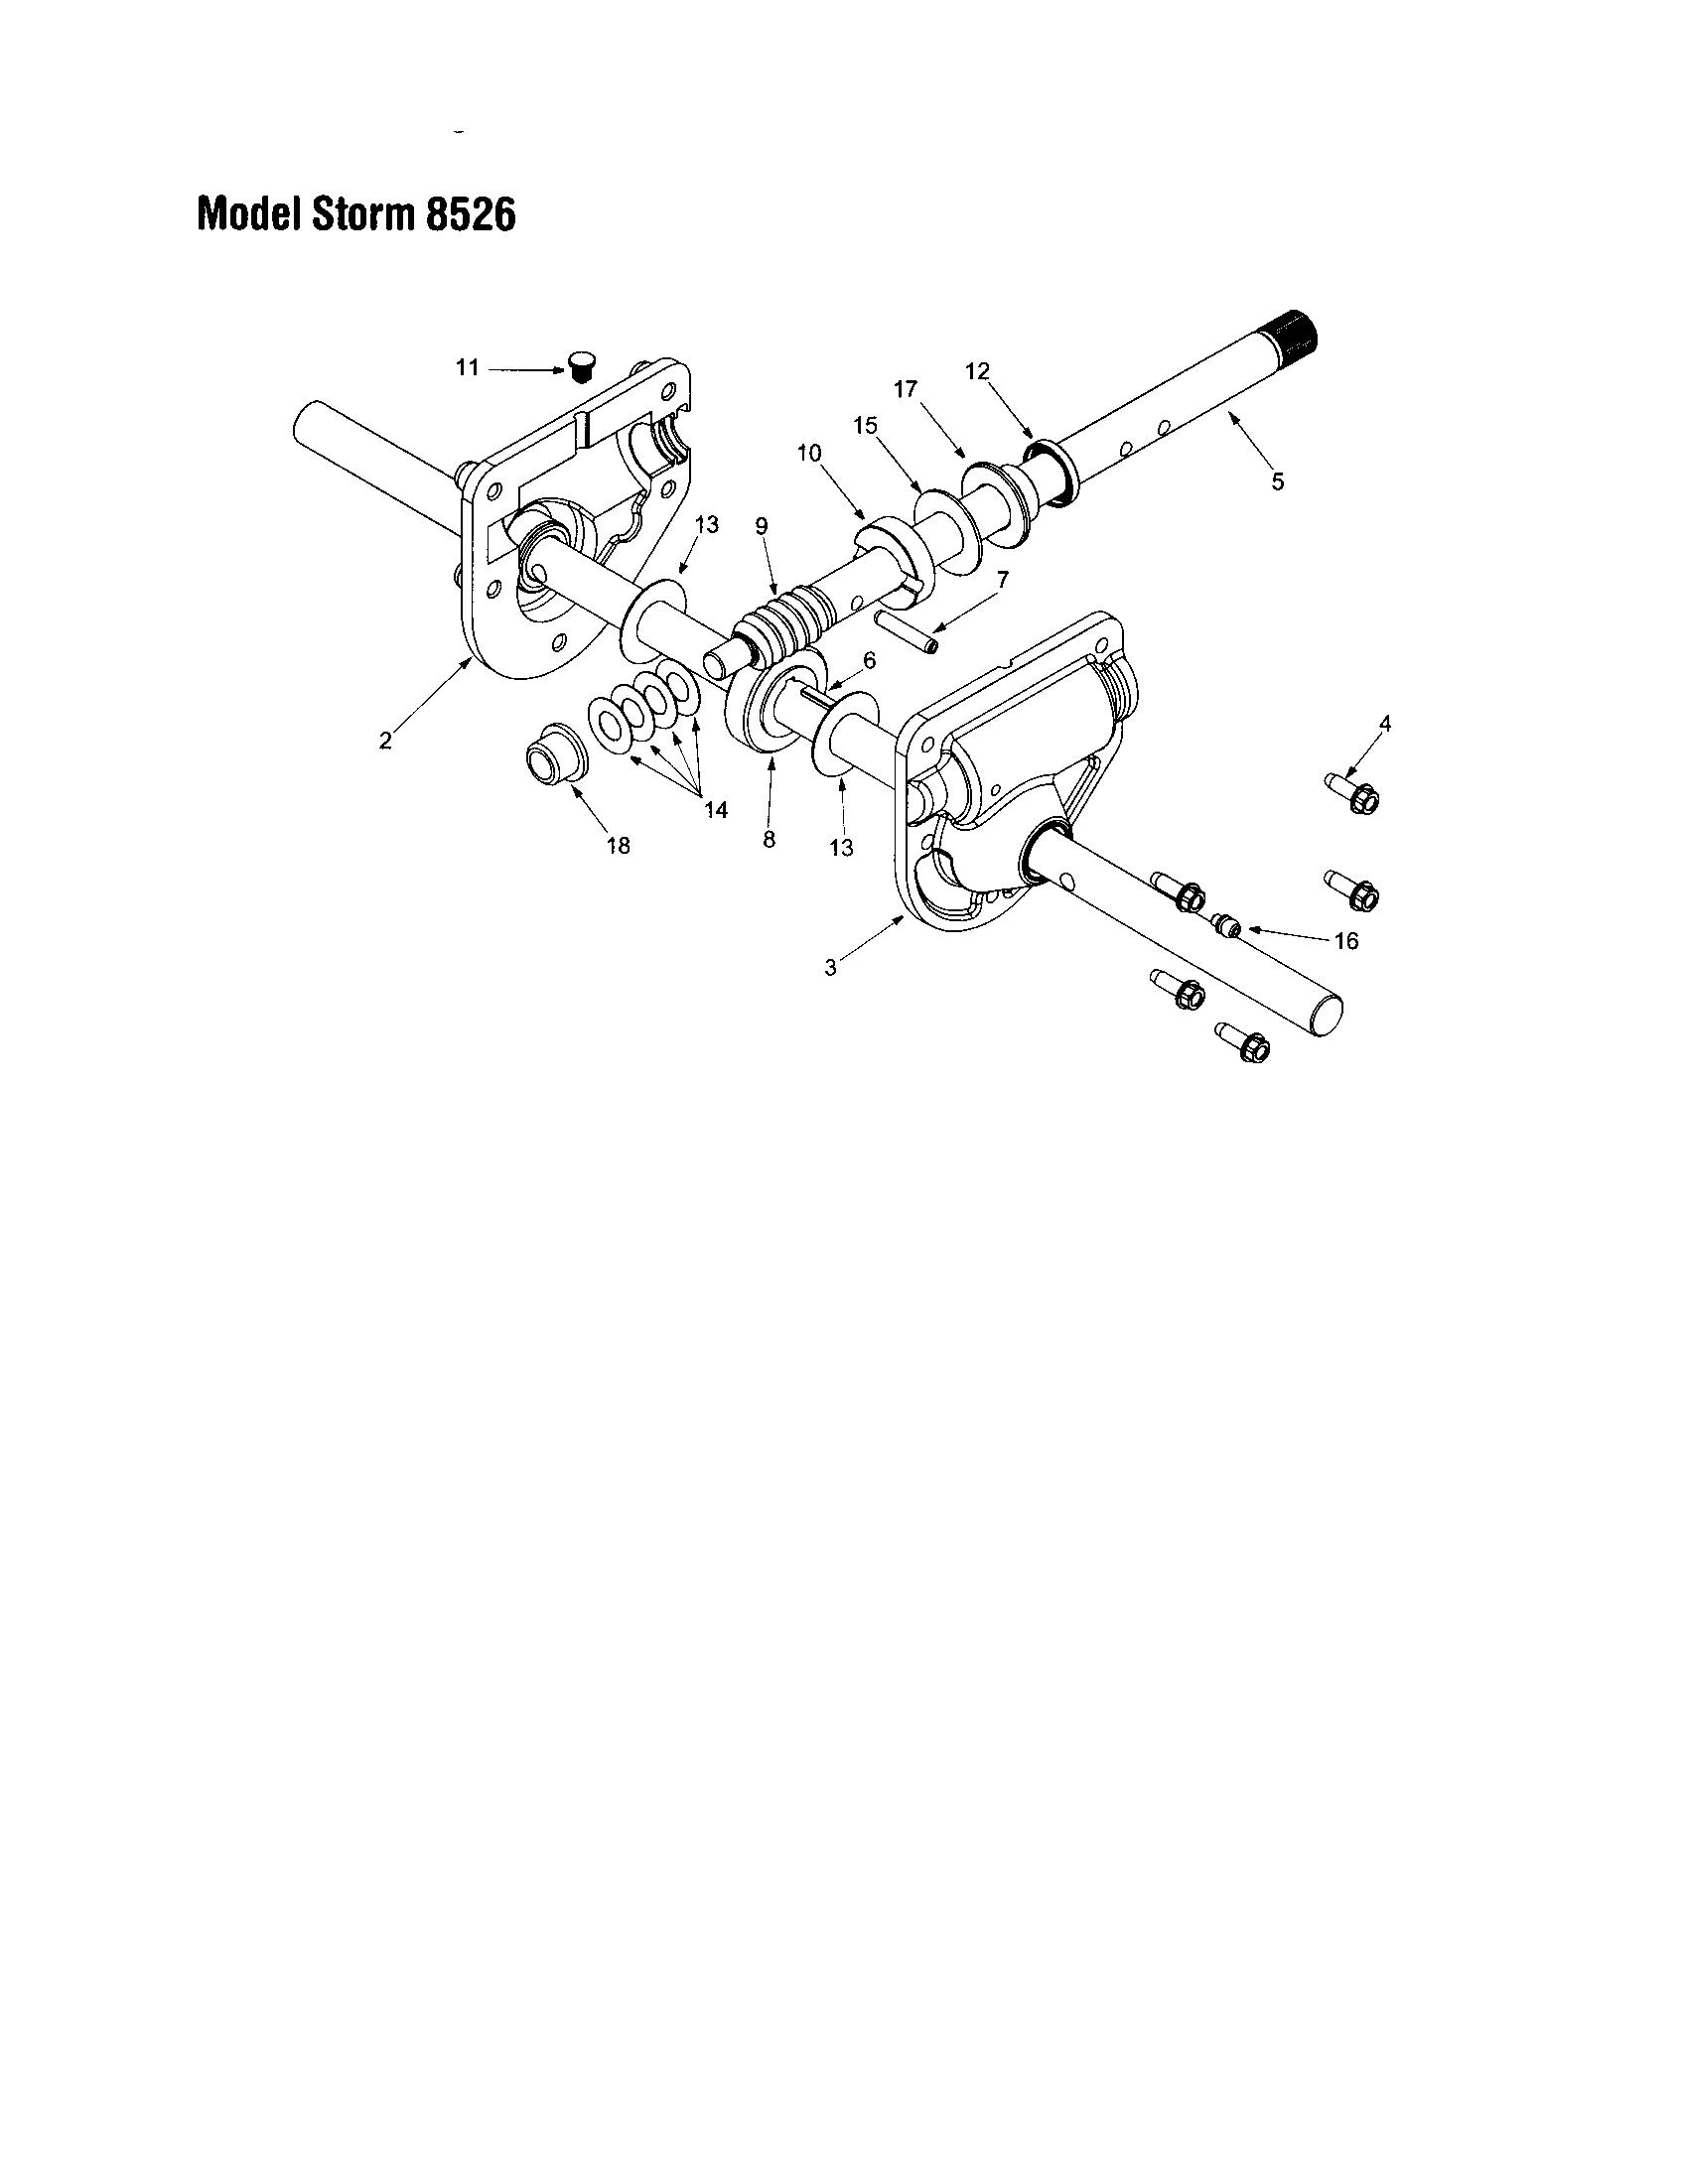 Troybilt model 31AE6S73063 snowthrower, gas genuine parts